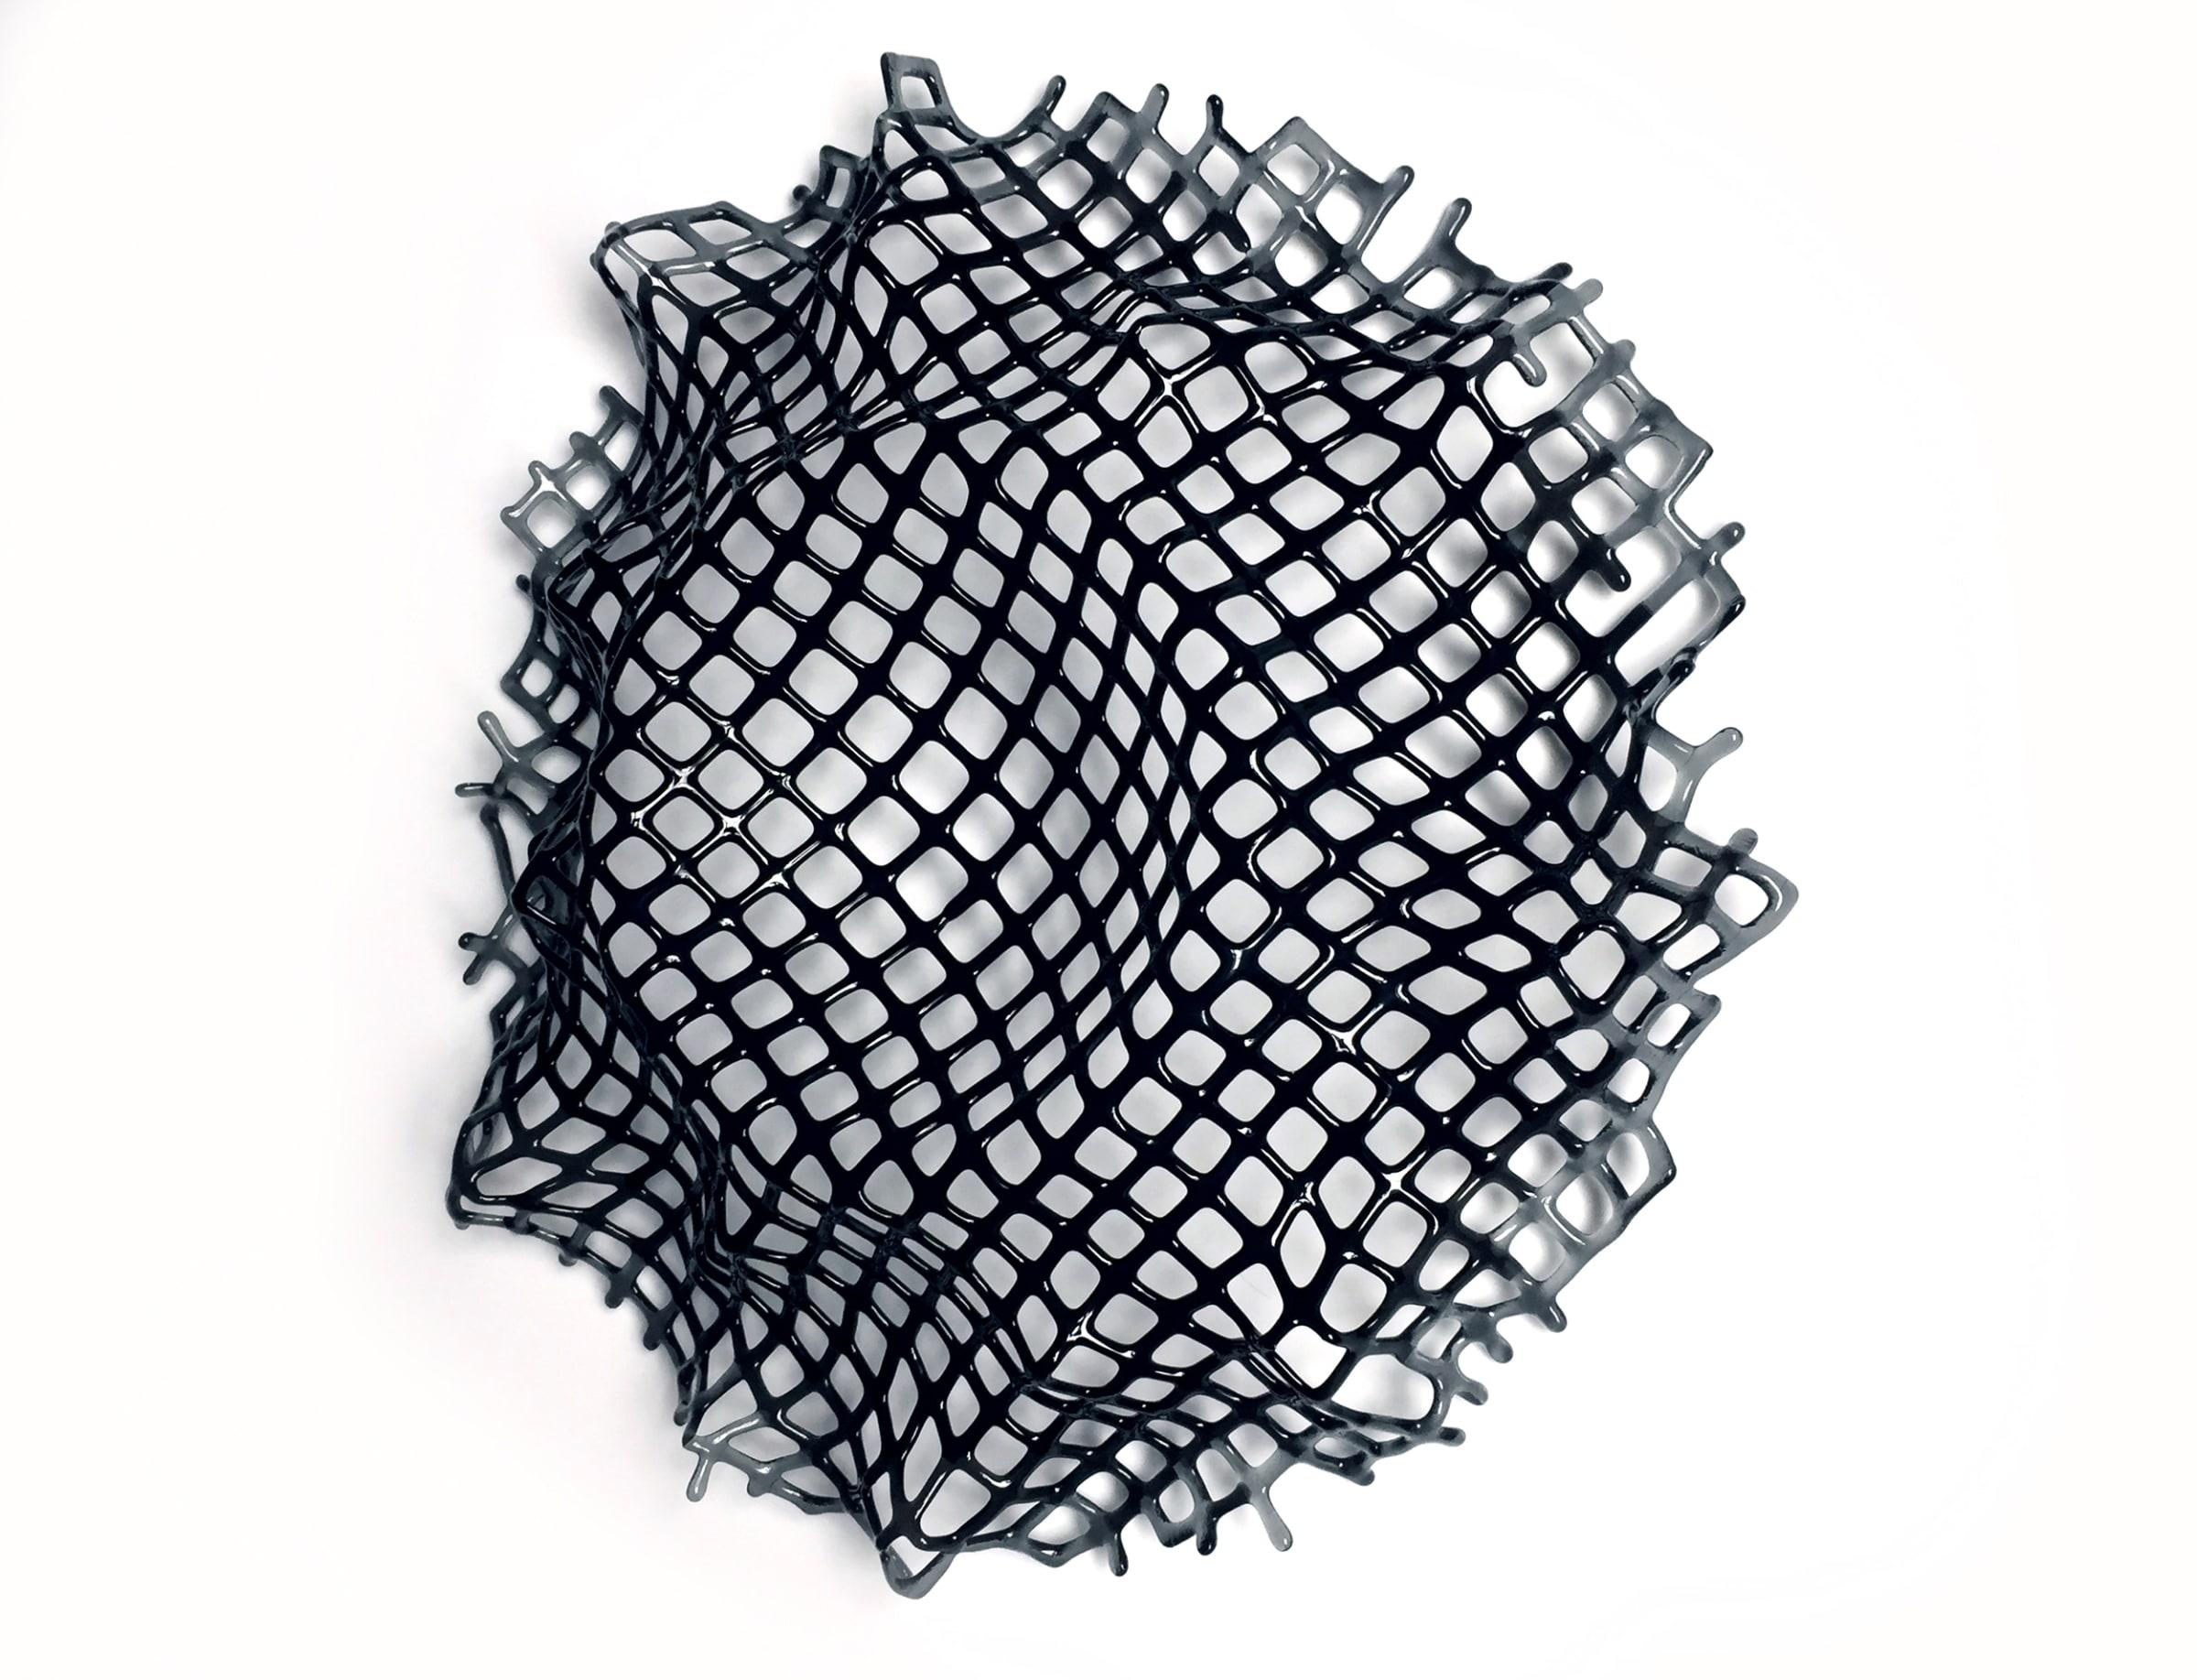 "<span class=""link fancybox-details-link""><a href=""/artists/194-lisa-pettibone/works/5227-lisa-pettibone-collapse-grey-to-black-2018/"">View Detail Page</a></span><div class=""artist""><strong>Lisa Pettibone</strong></div> b. 1960 <div class=""title""><em>Collapse - Grey to Black</em>, 2018</div> <div class=""medium"">fused glass vessel </div> <div class=""dimensions"">50 x 50 x 9 cm<br /> 19 3/4 x 19 3/4 x 3 1/2 inches</div><div class=""price"">£1,460.00</div><div class=""copyright_line"">OwnArt: £ 146 x 10 Months, 0% APR</div>"